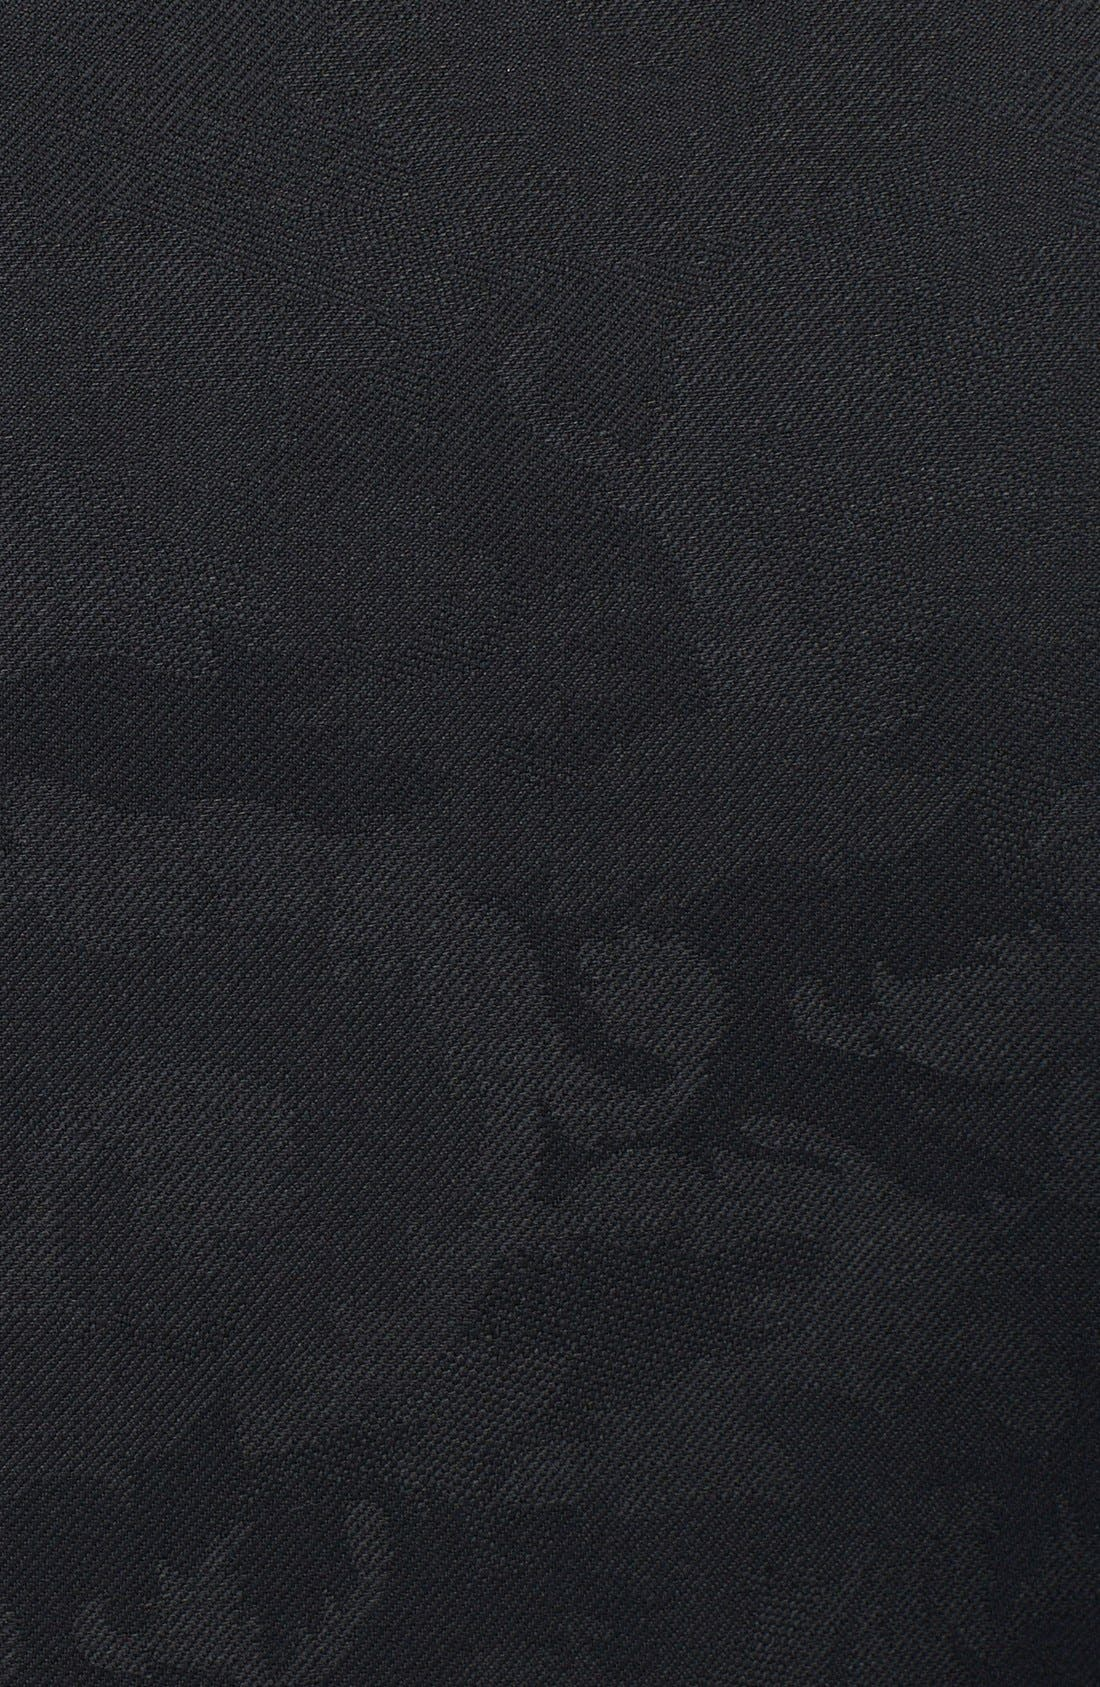 Alternate Image 3  - Versace Trend Fit Jacquard Wool Blend Sport Coat